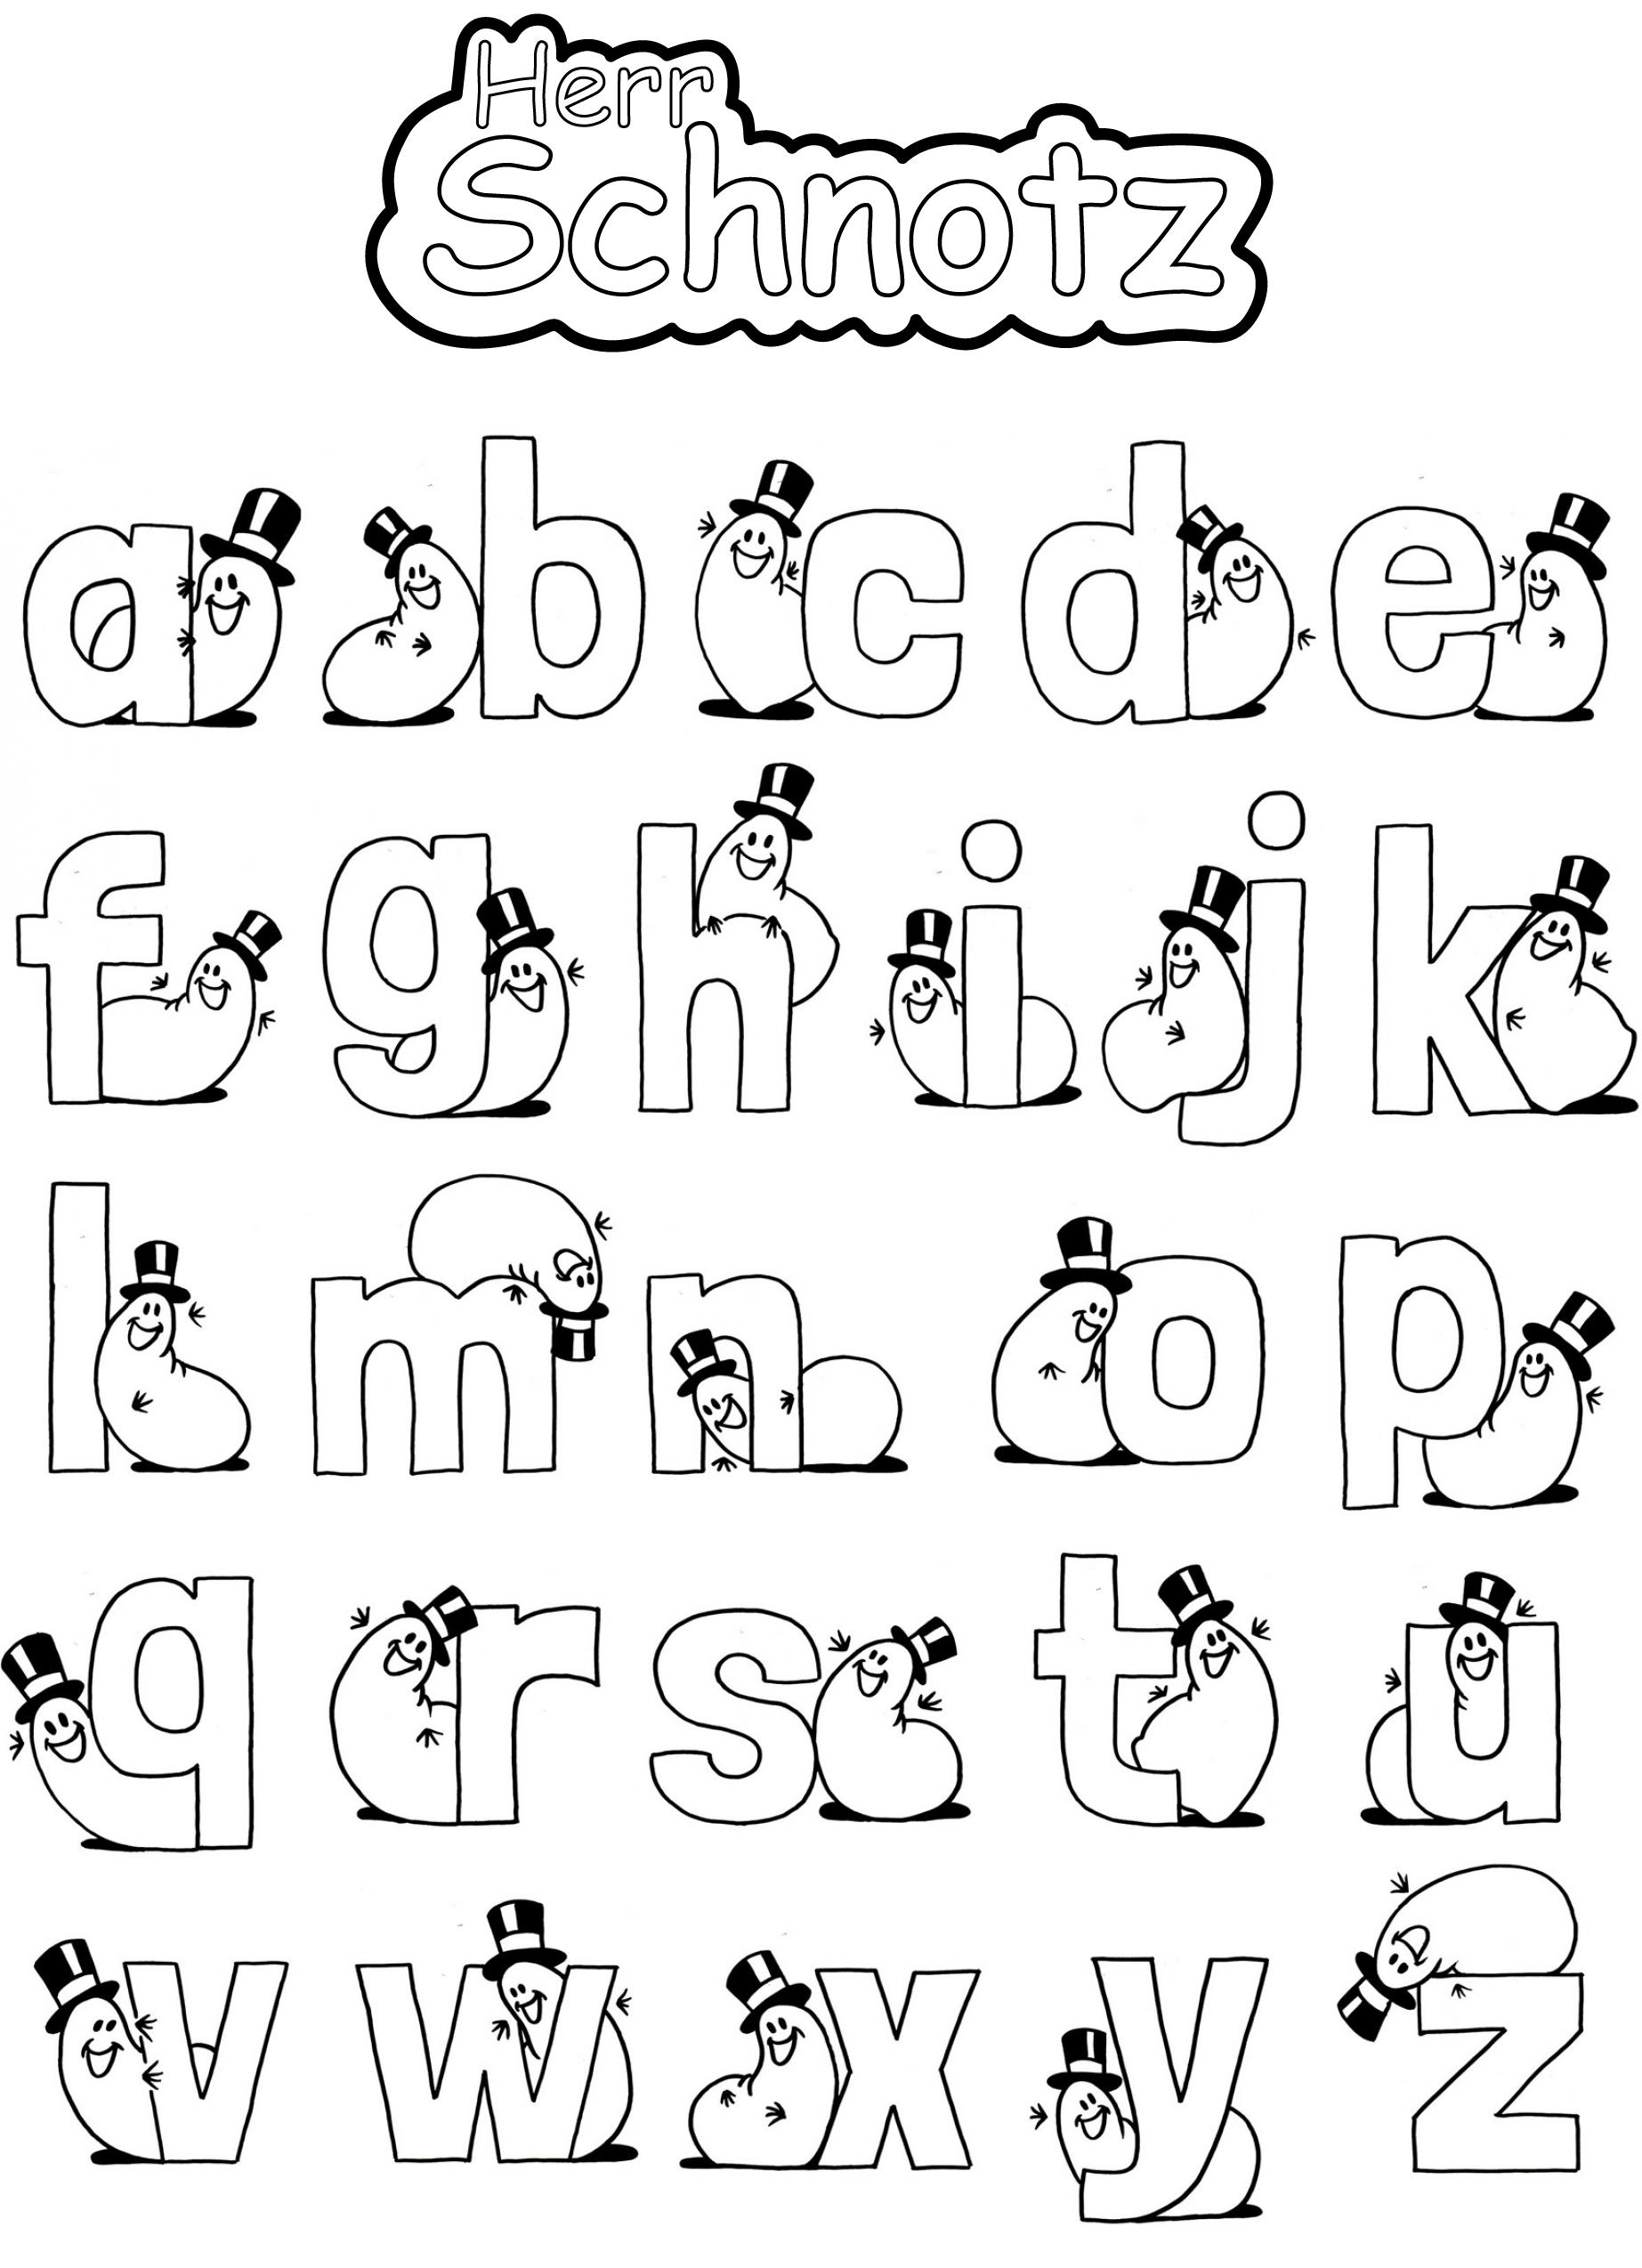 Alphabet - Herr Schnotz